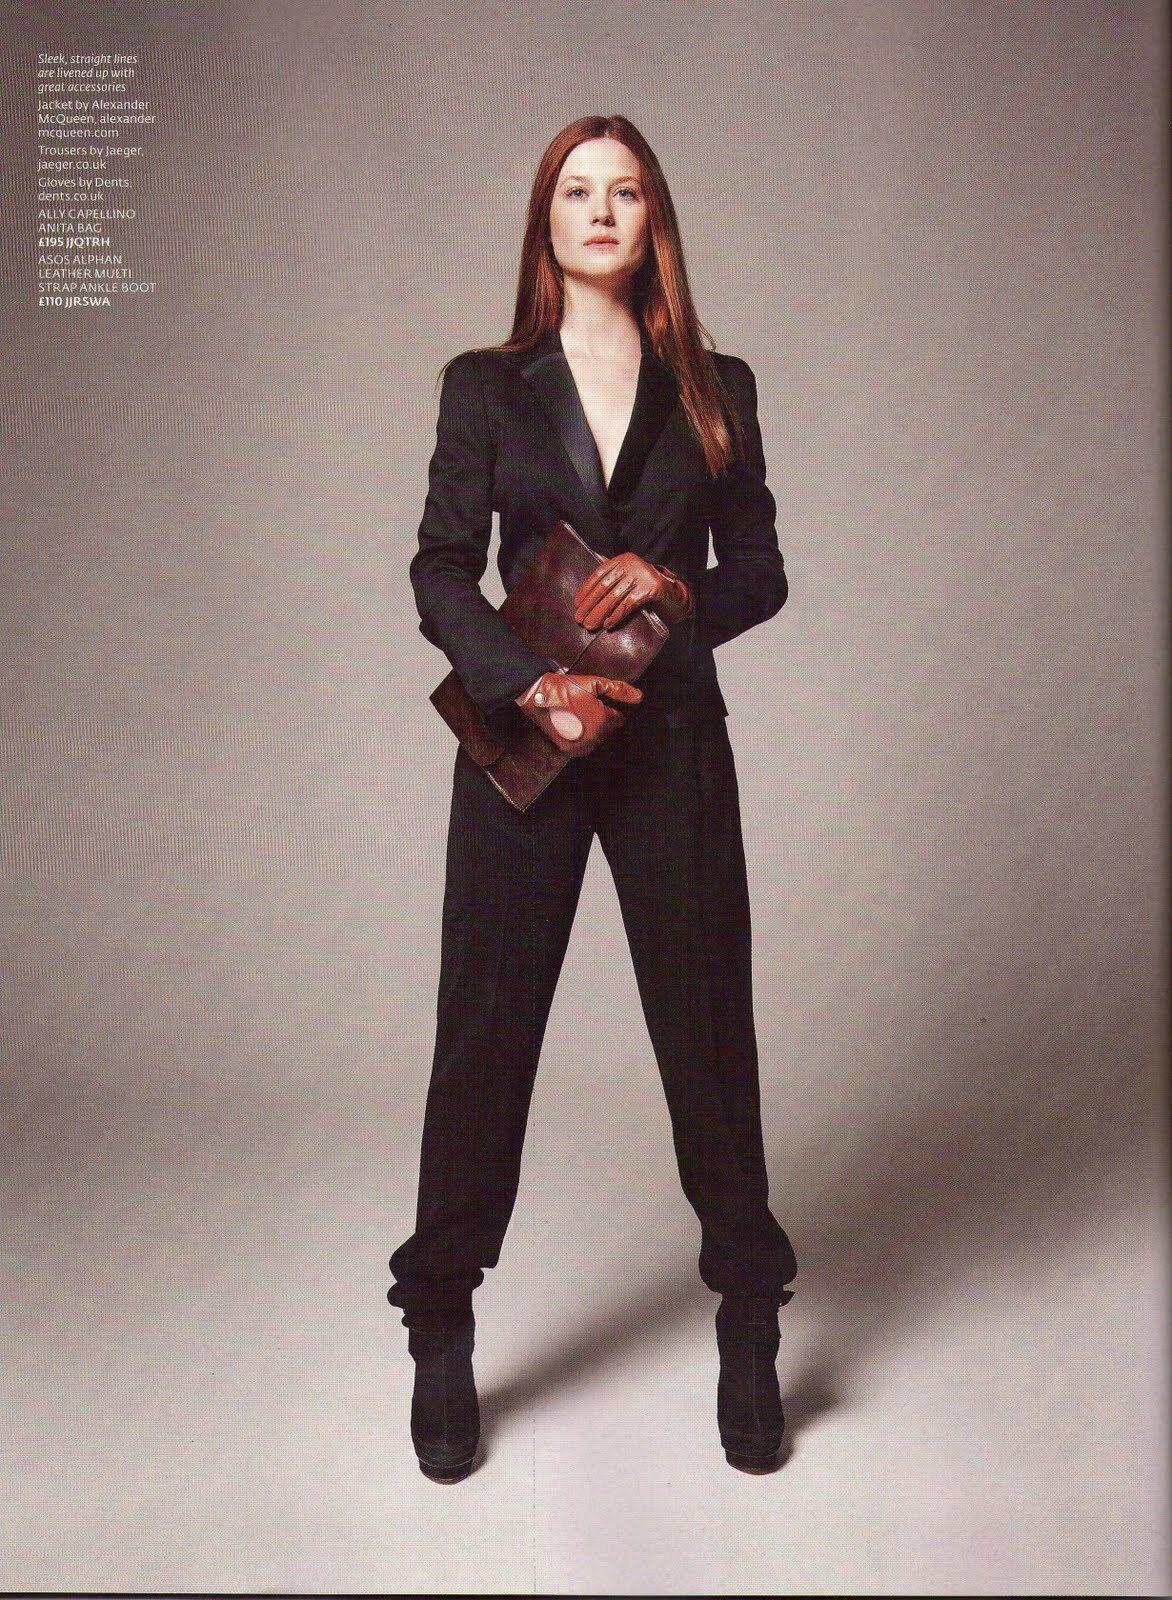 images Bonnie Wright (born 1991)